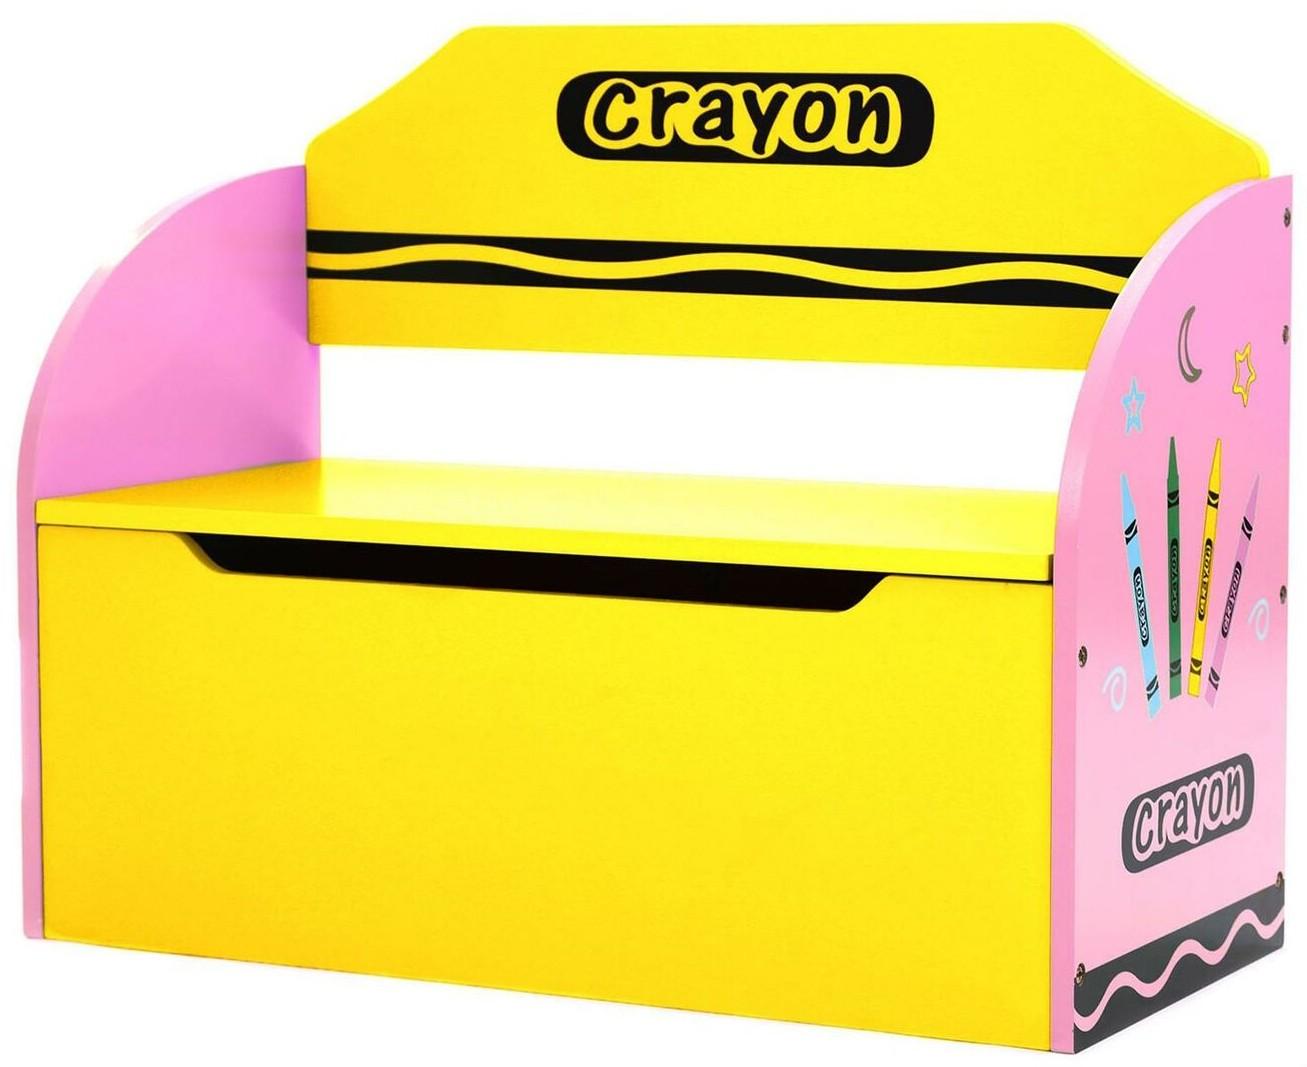 Bancuta pentru depozitare jucarii Pink Crayon imagine